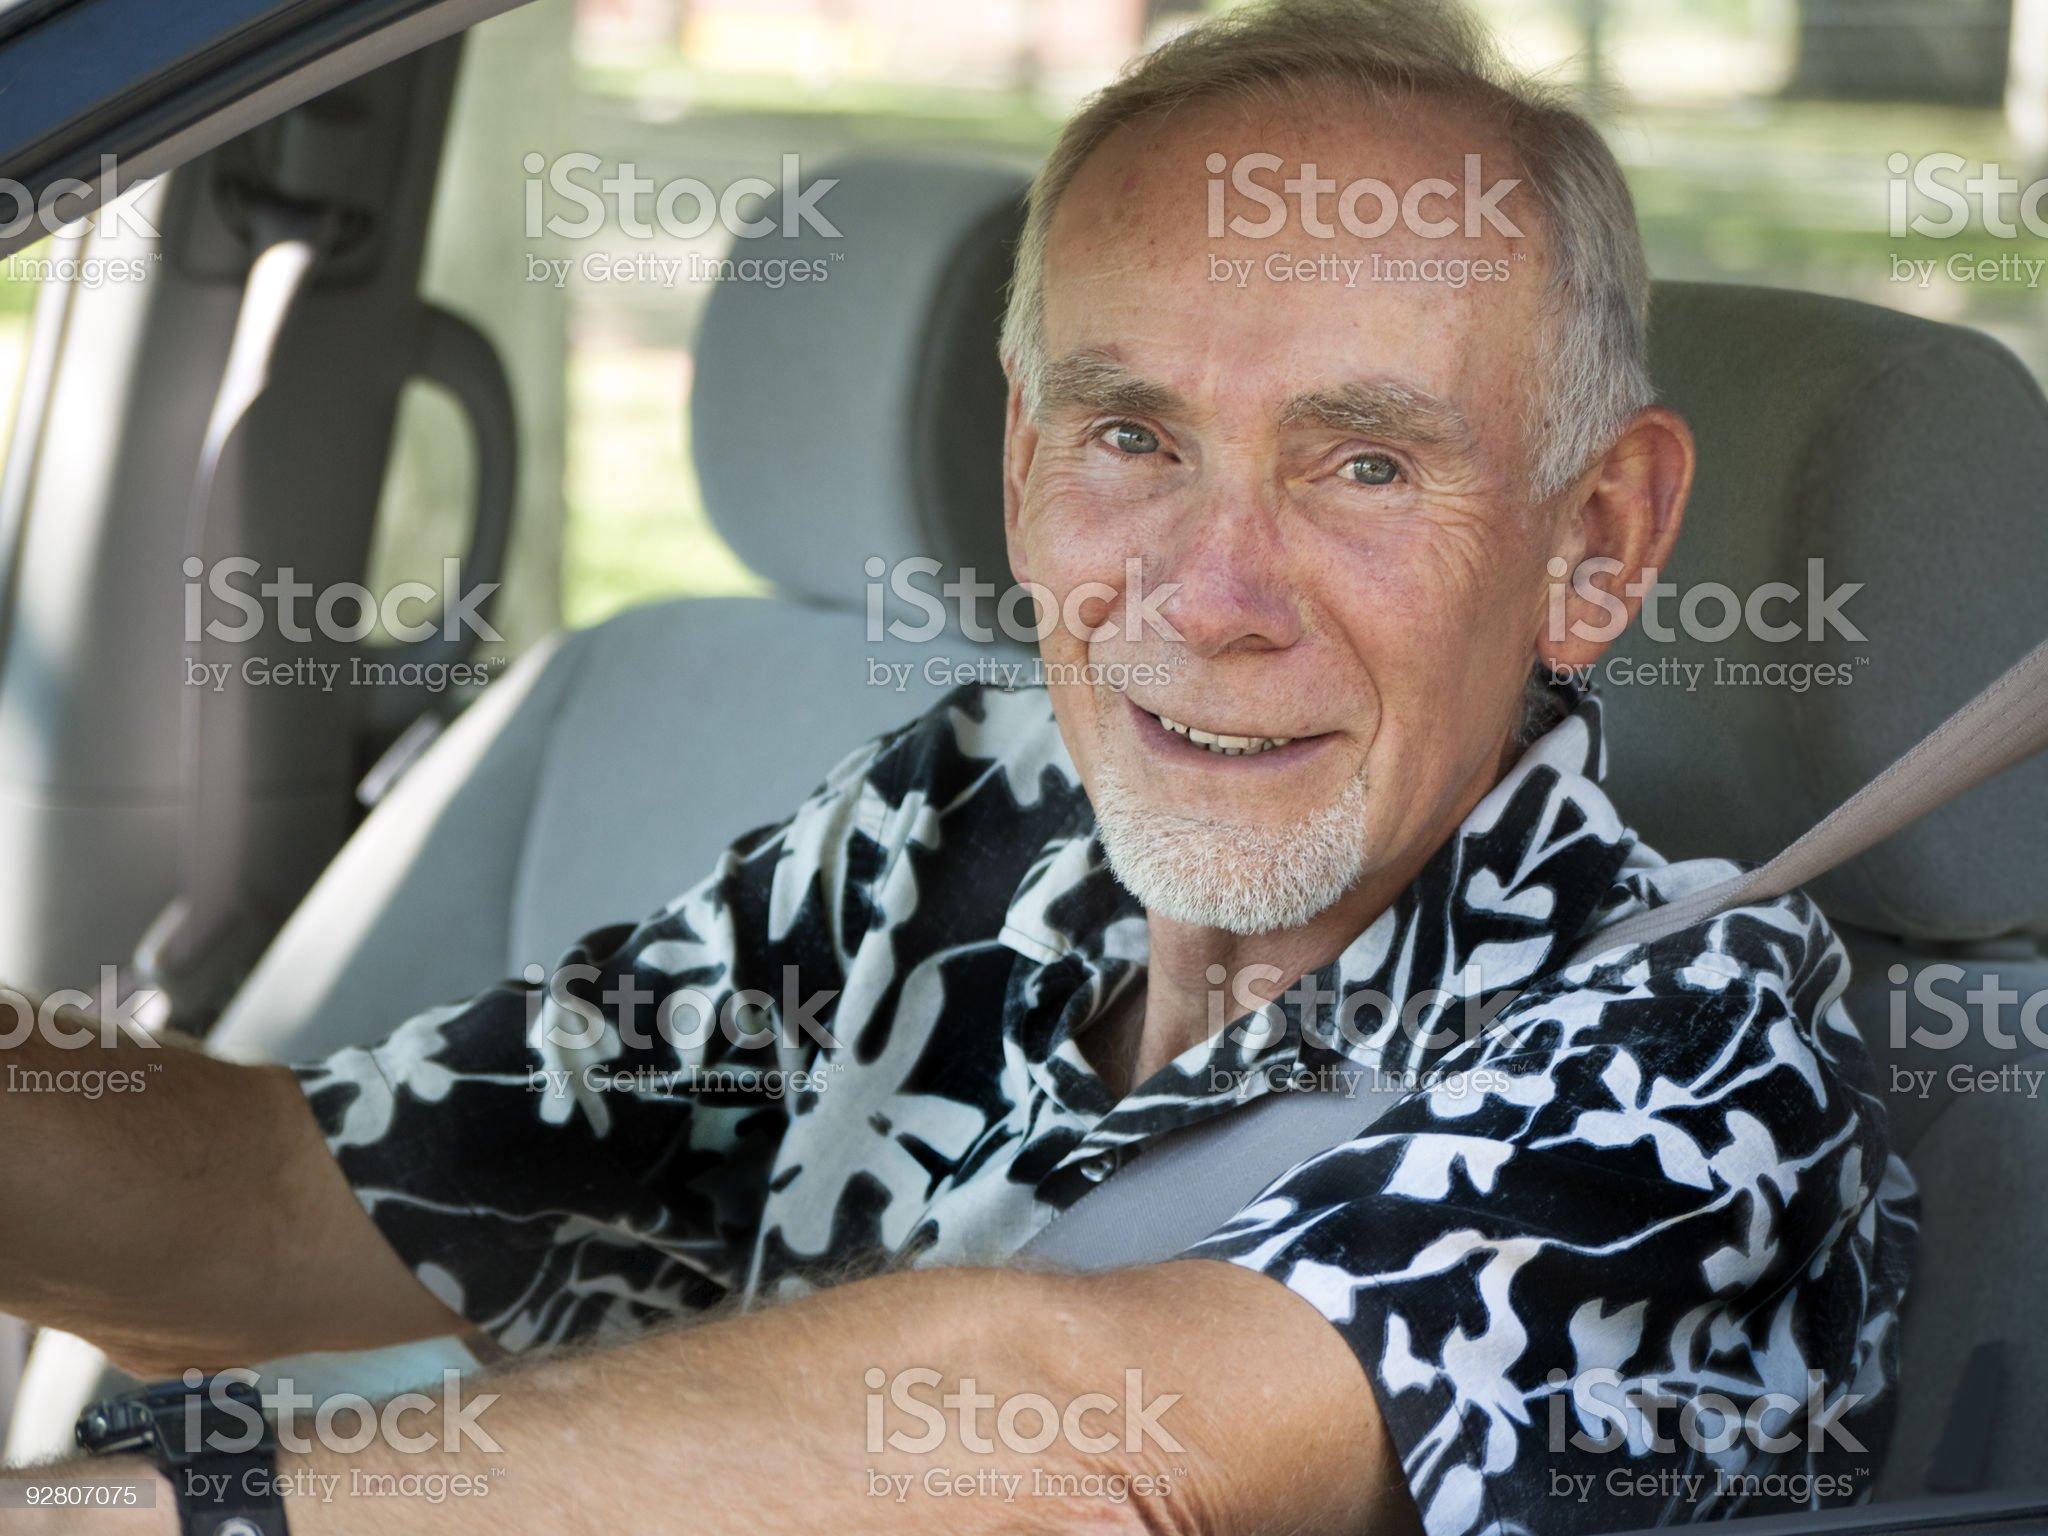 Senior man sitting in front seat of car, smiling. royalty-free stock photo